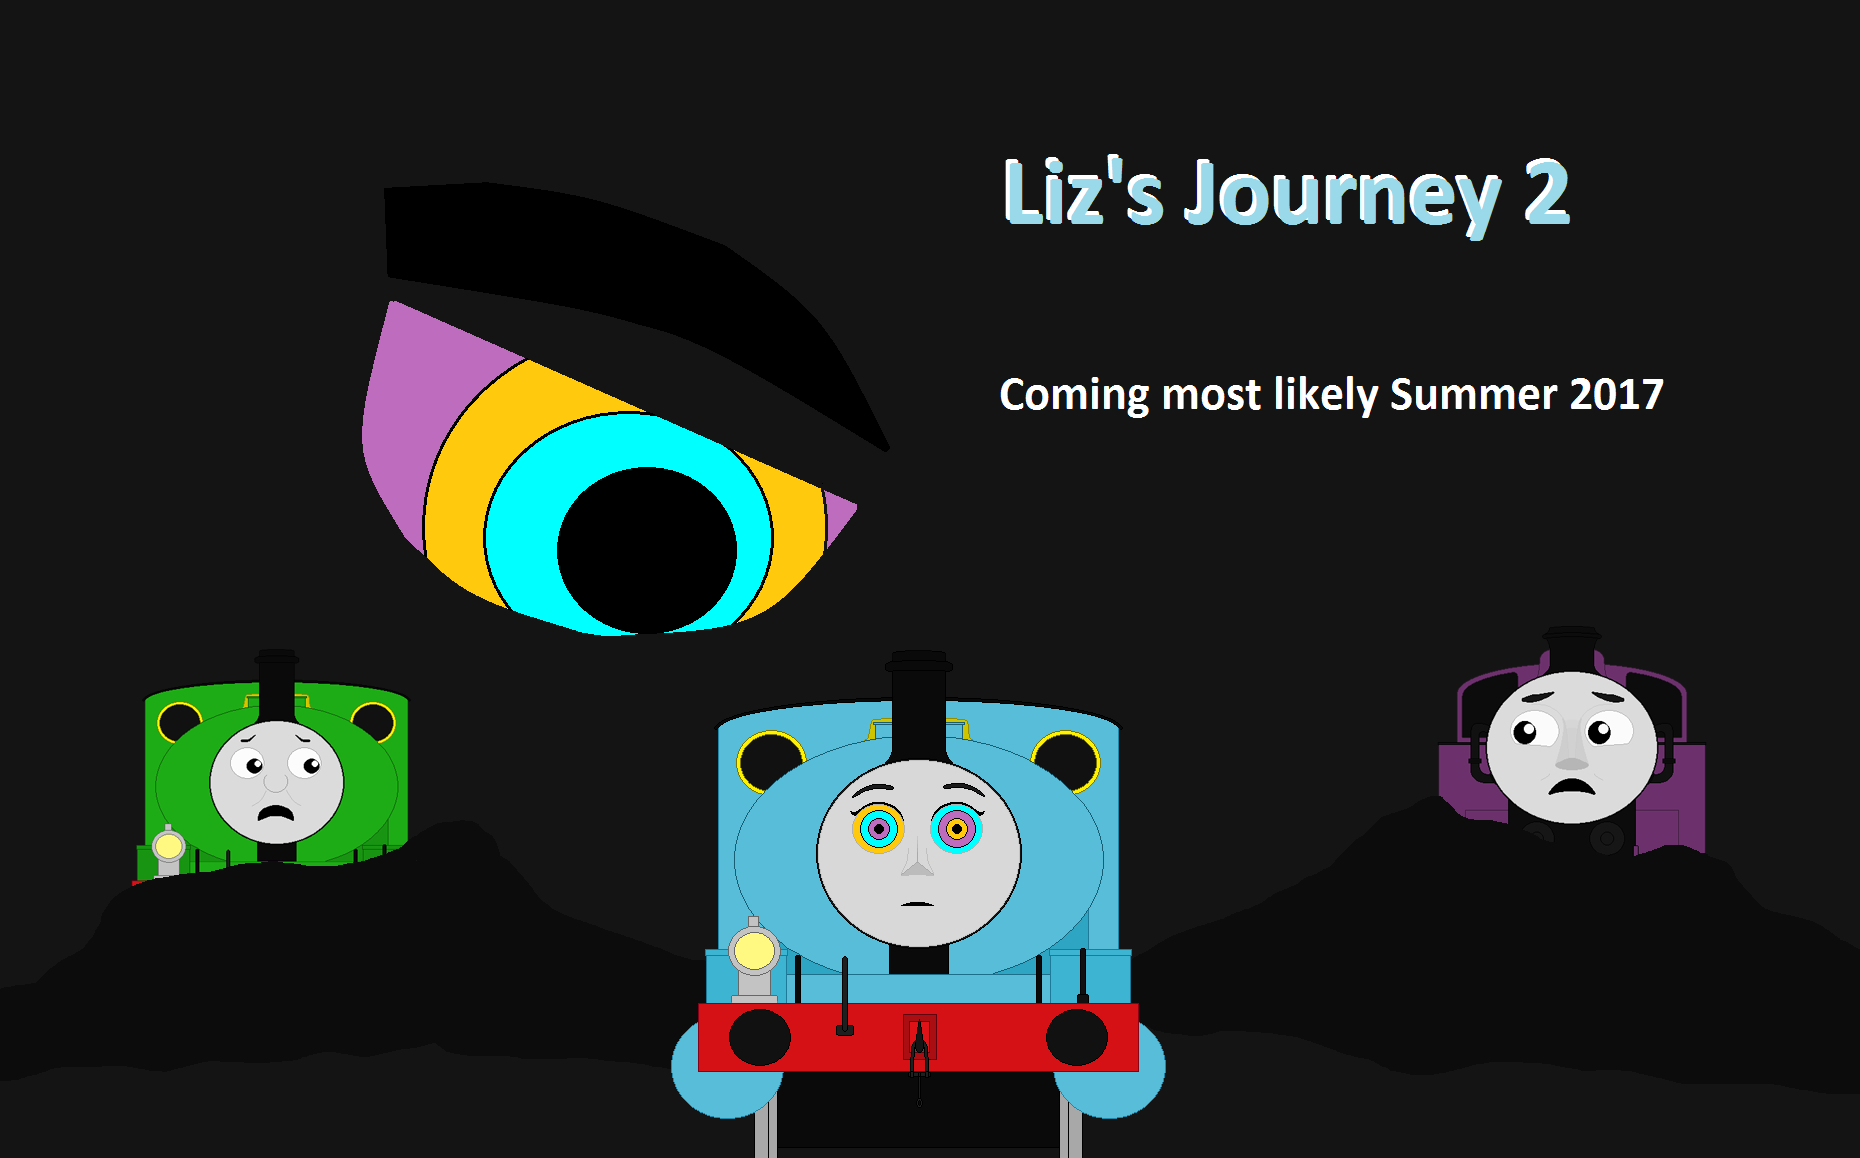 Liz's Journey 2 Teaser Poster by BlueEngineLiz6